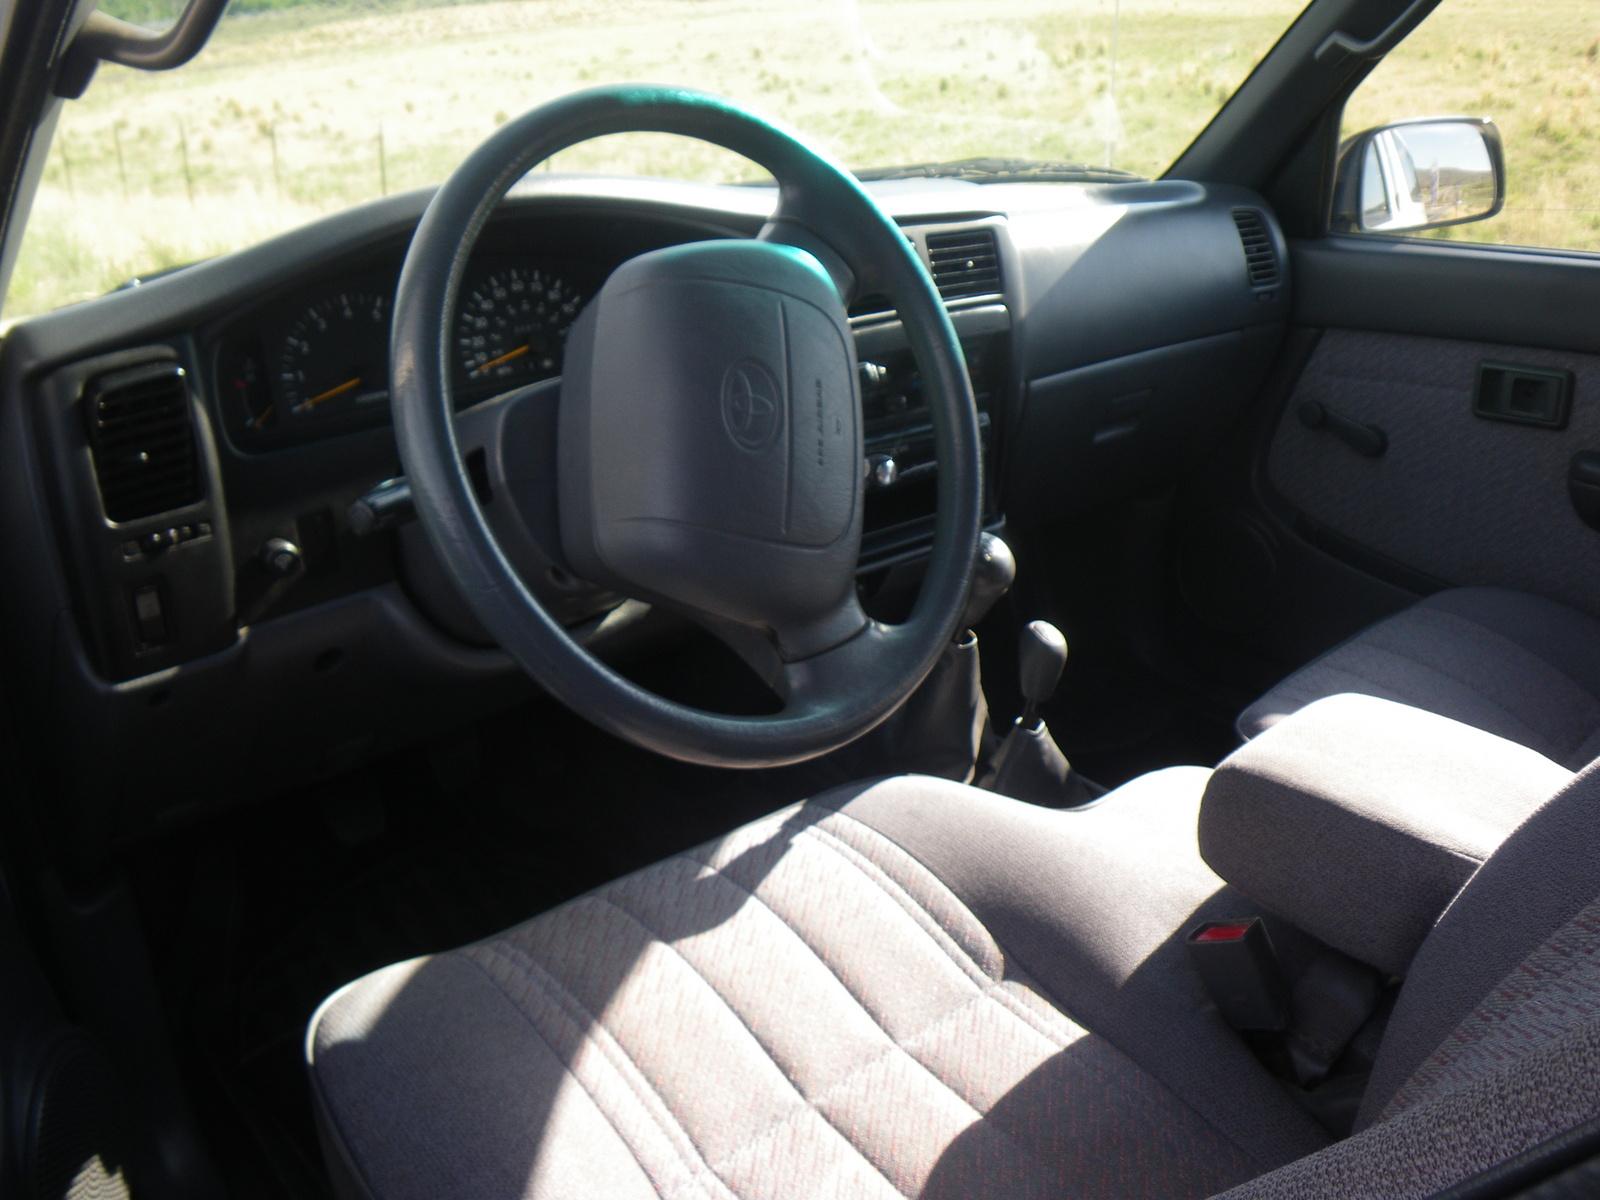 1995 Toyota Tacoma Pictures Cargurus